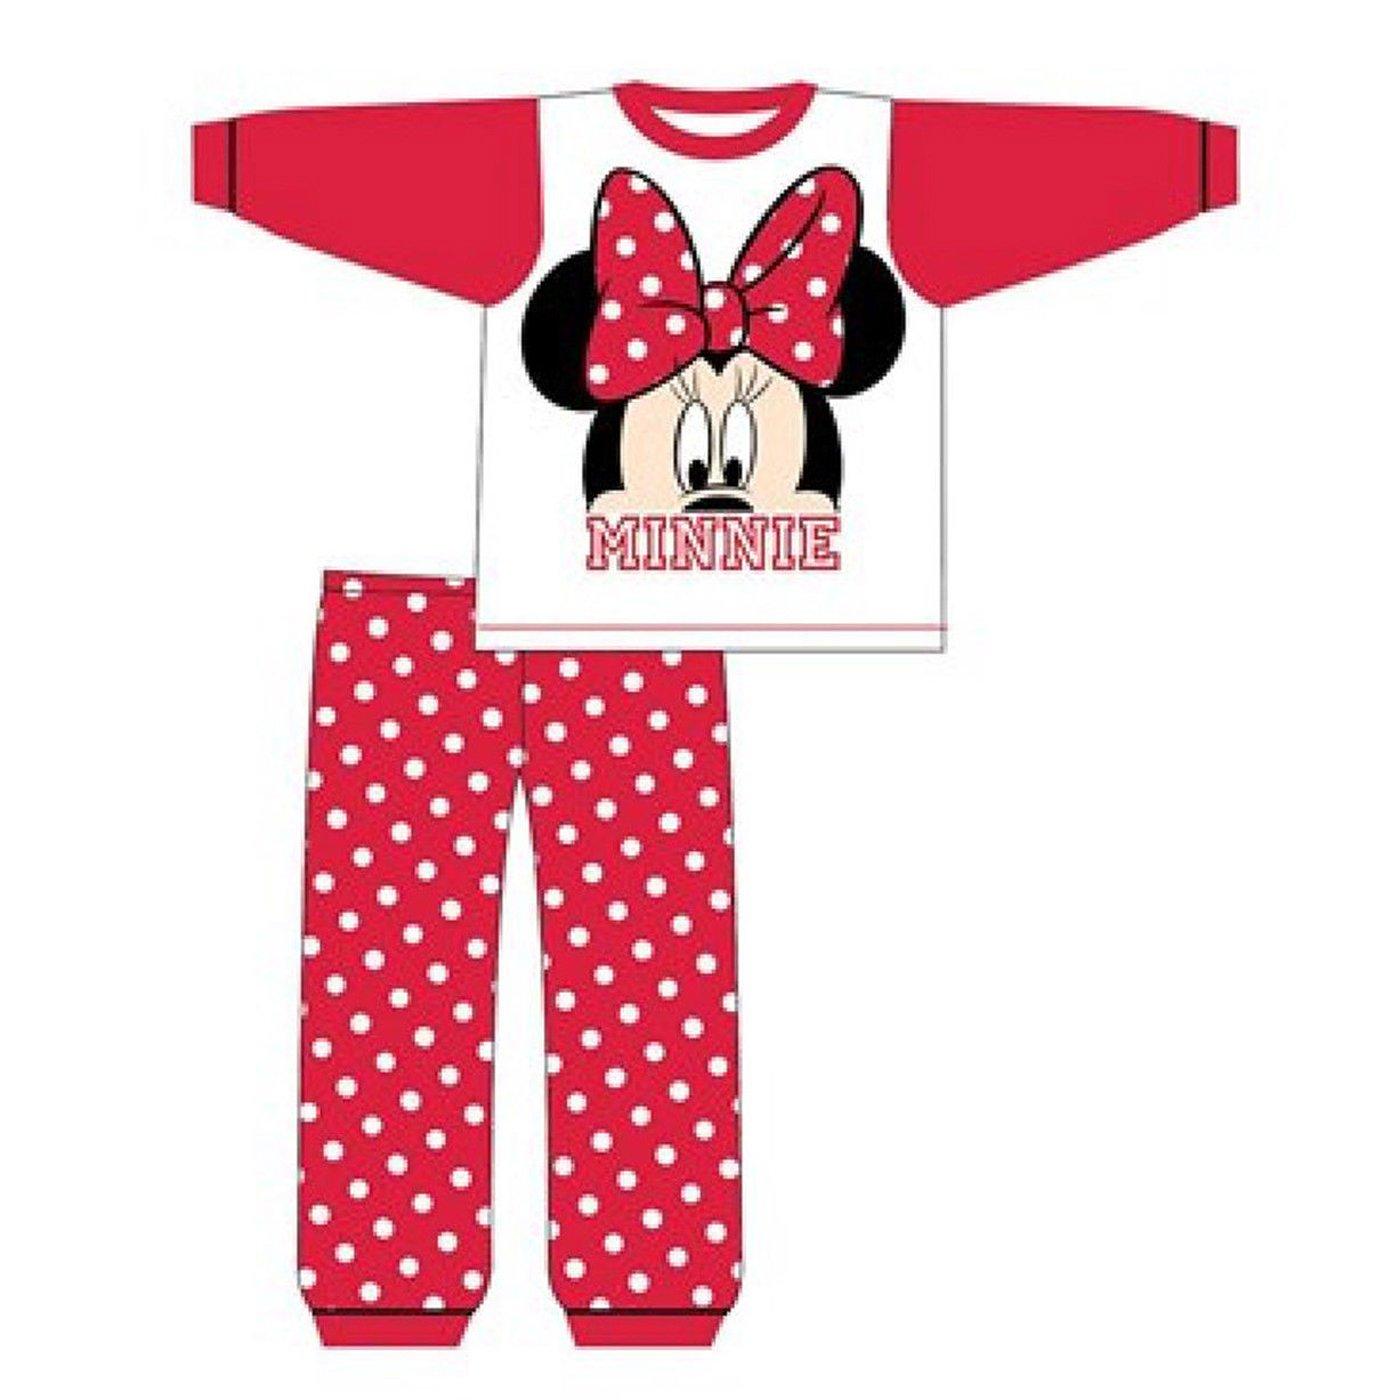 Baby Girl Disney Minnie Mouse Pyjamas Polka Dot 6 to 24 Months